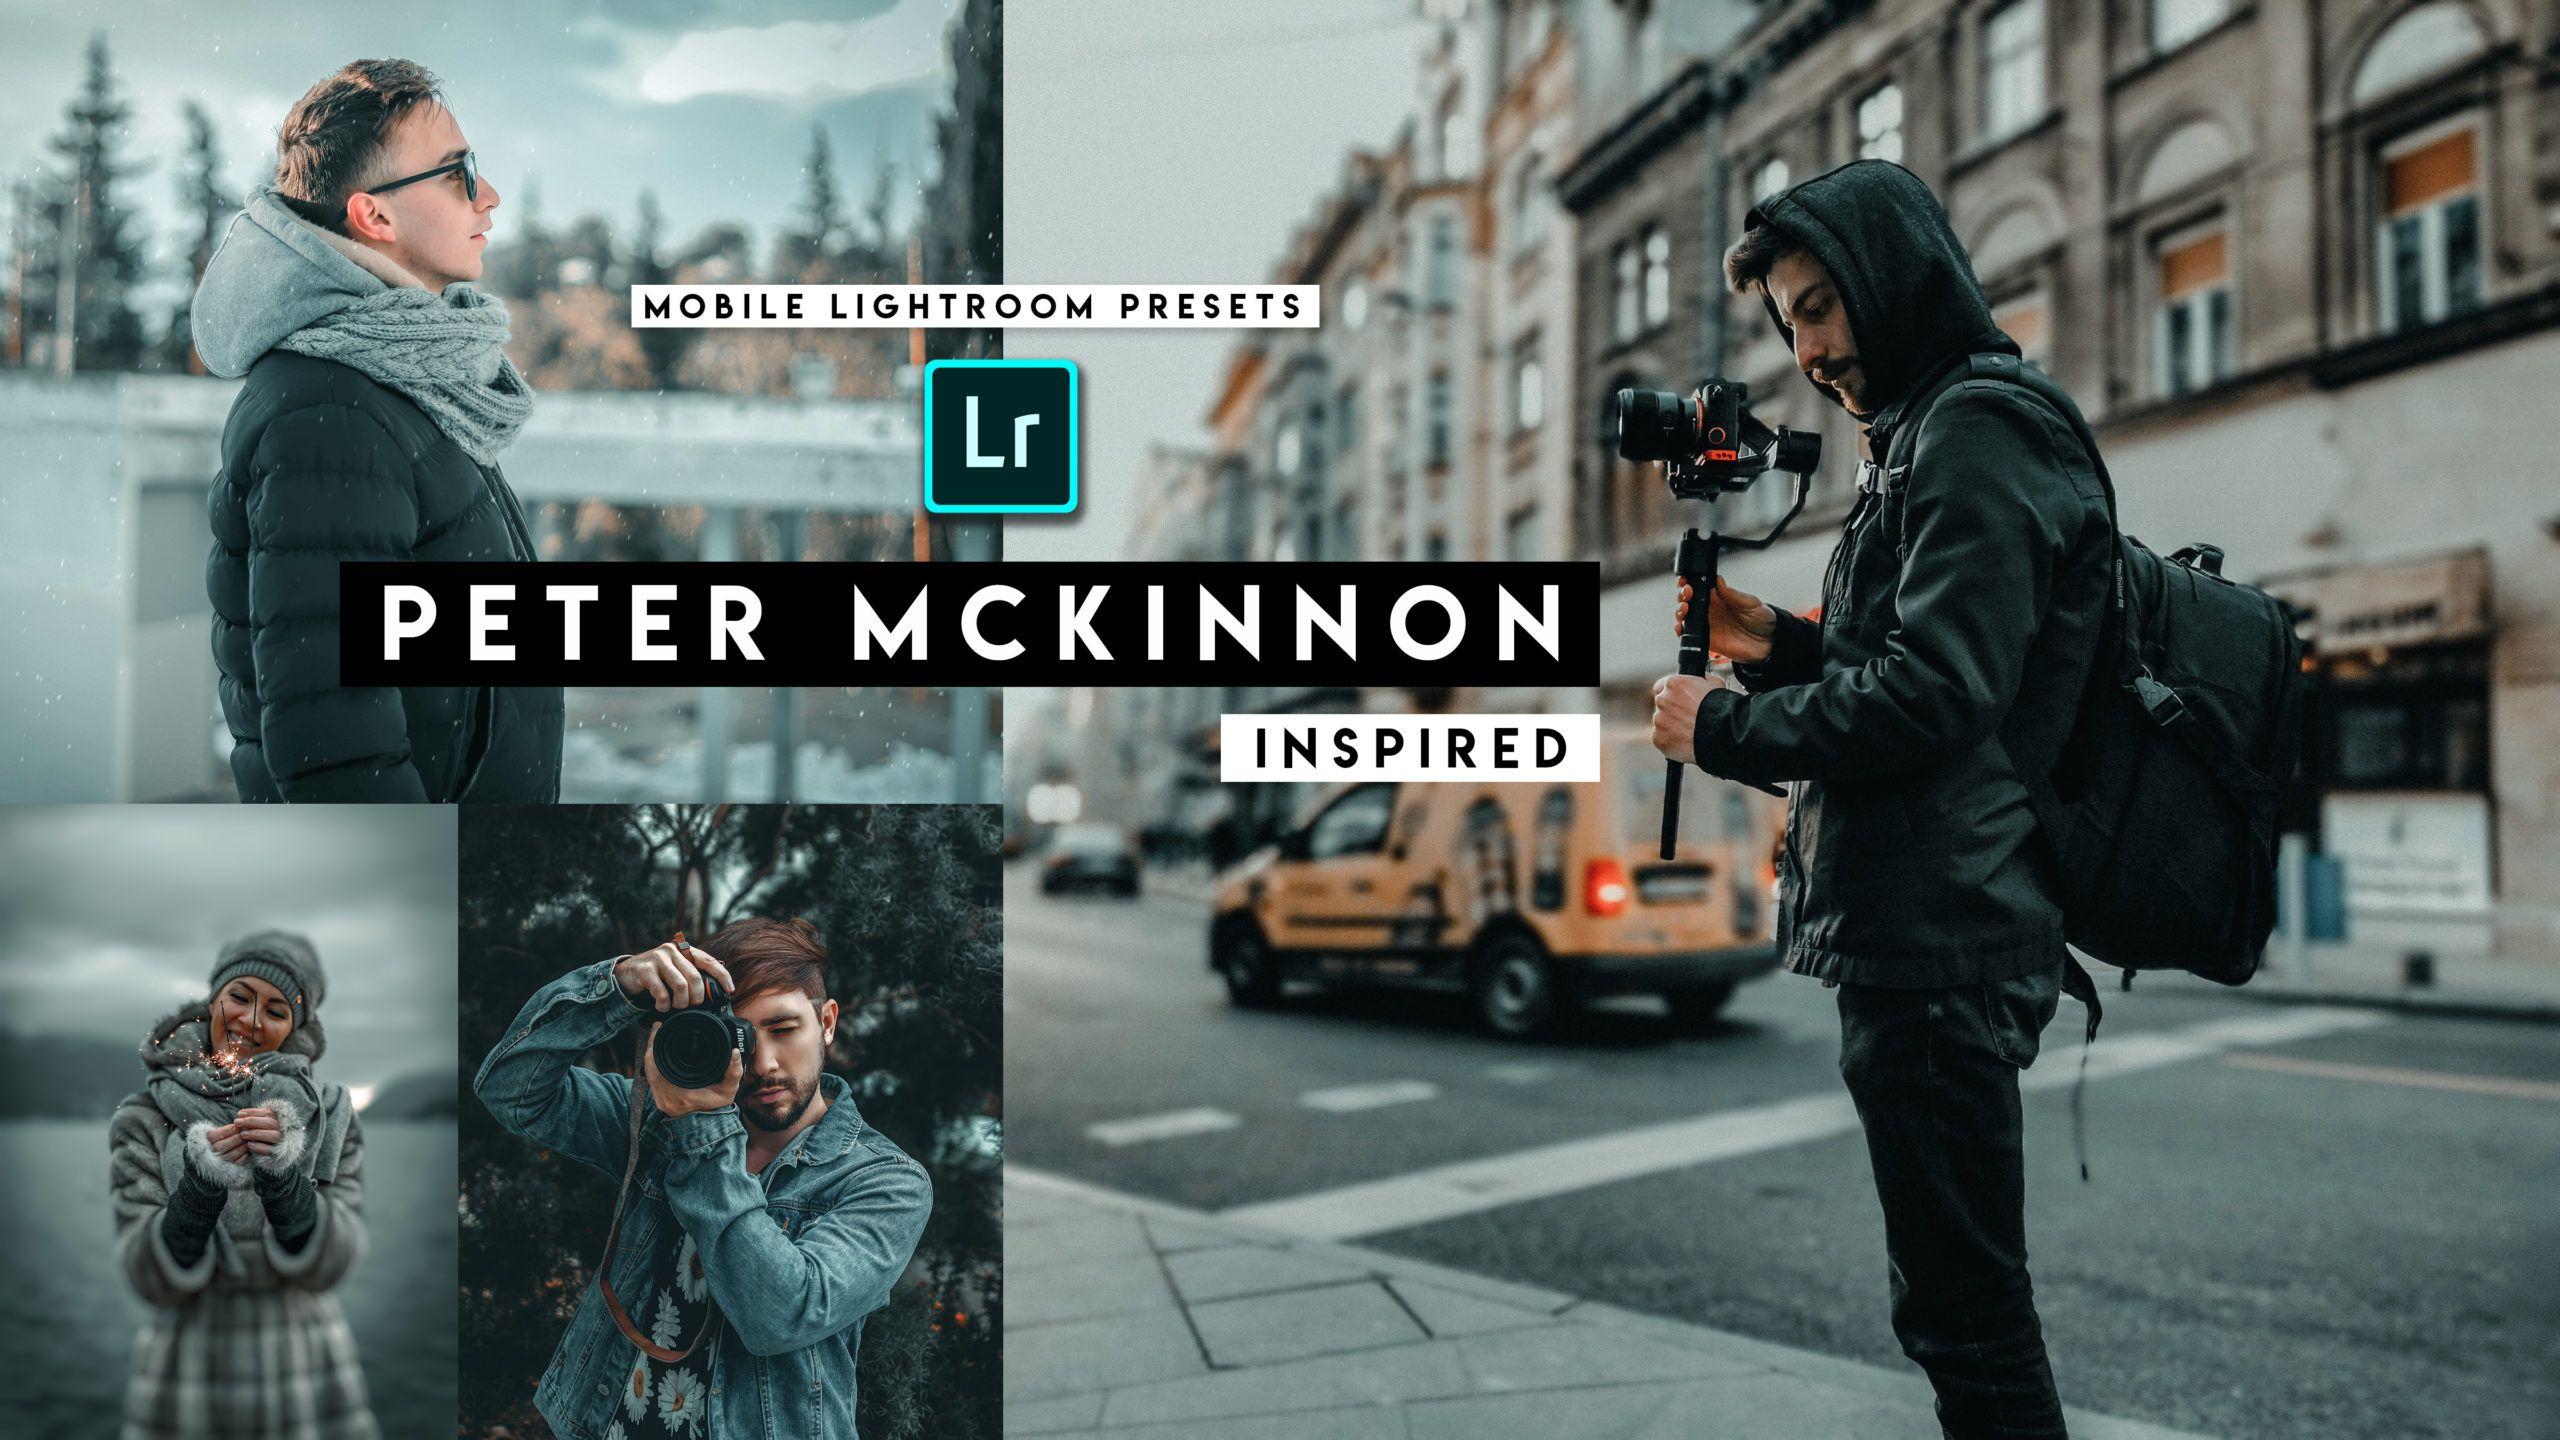 Peter mckinnon lightroom presets free download